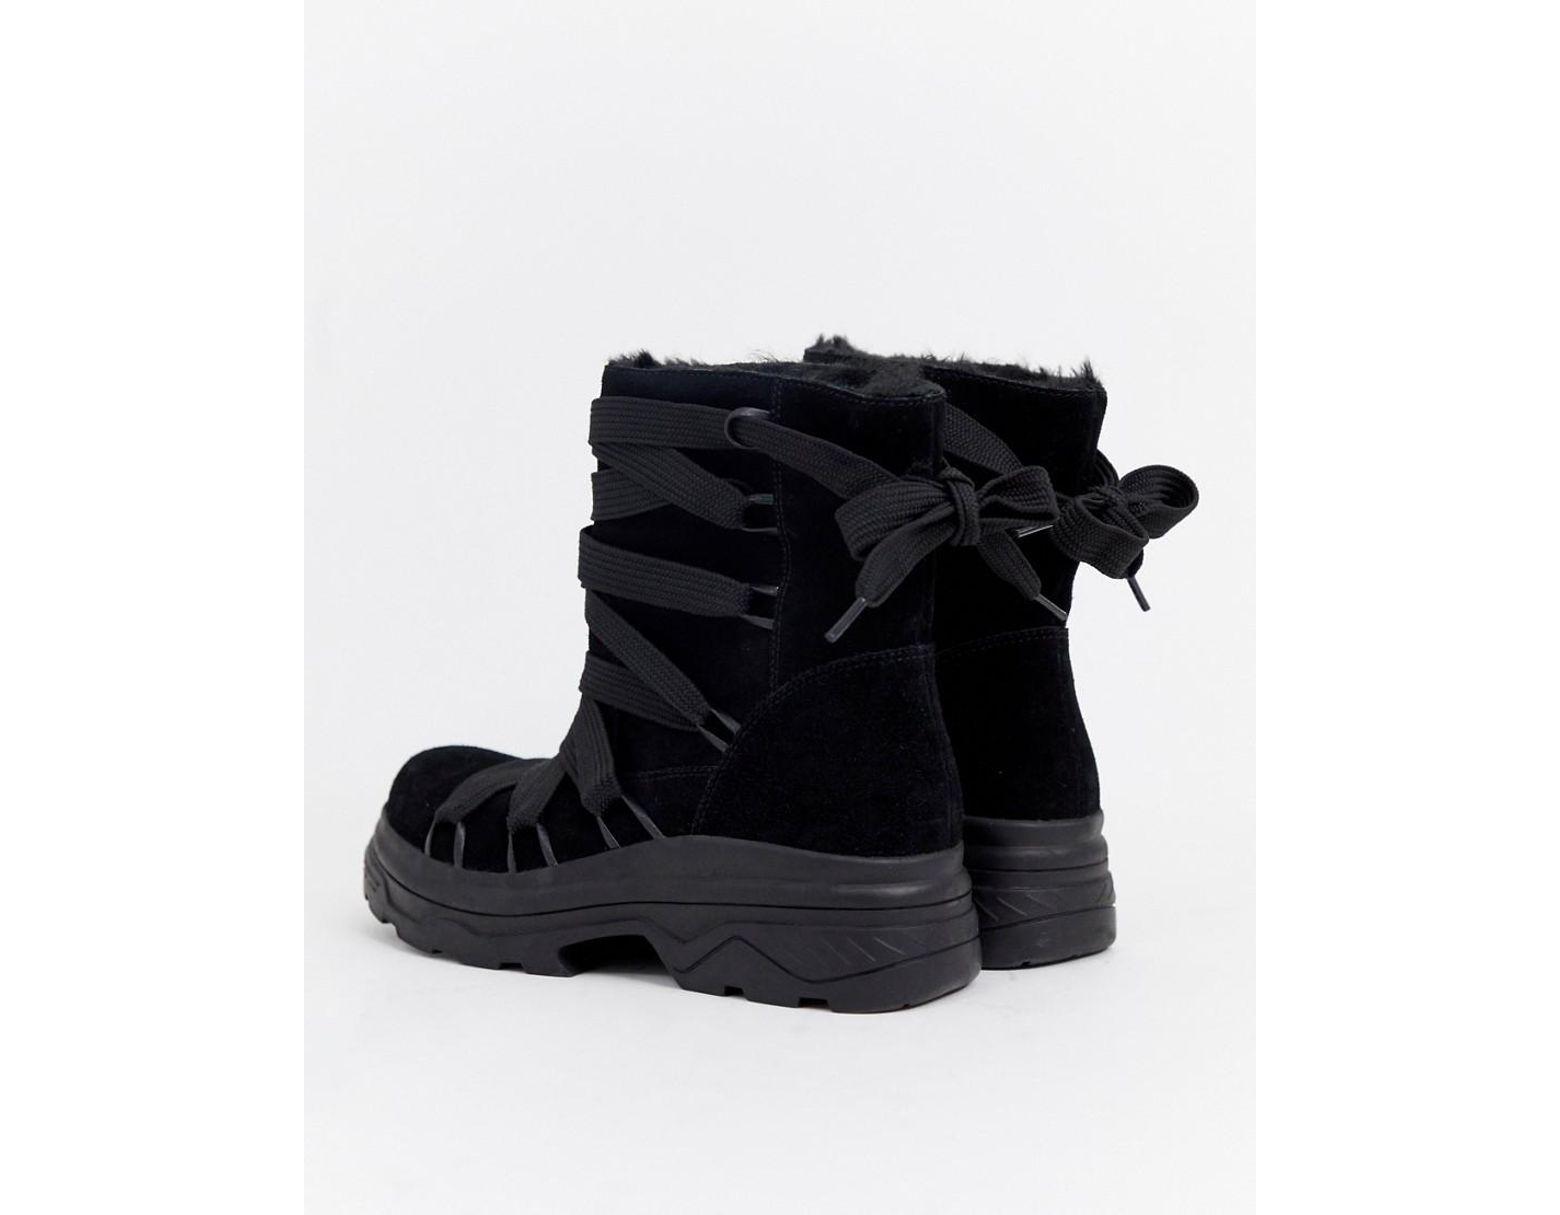 7015c171479 Women's Black Adaptive Chunky Suede Aprs Ski Boots